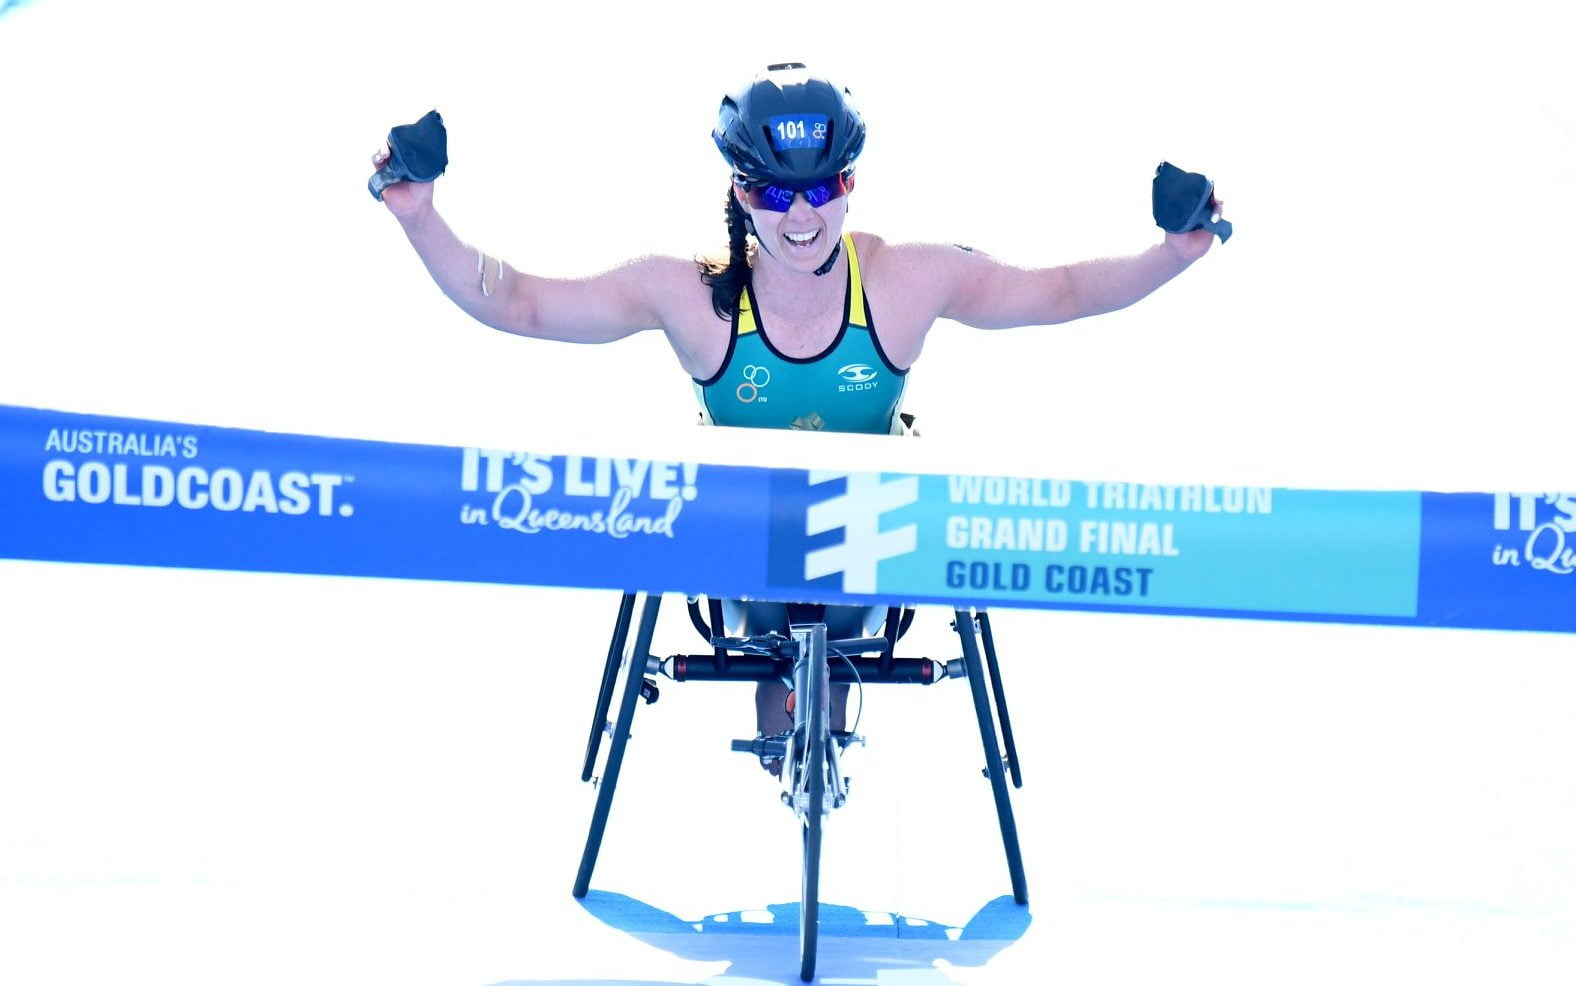 Tapp turned on full bore as Emily strikes World Championships gold